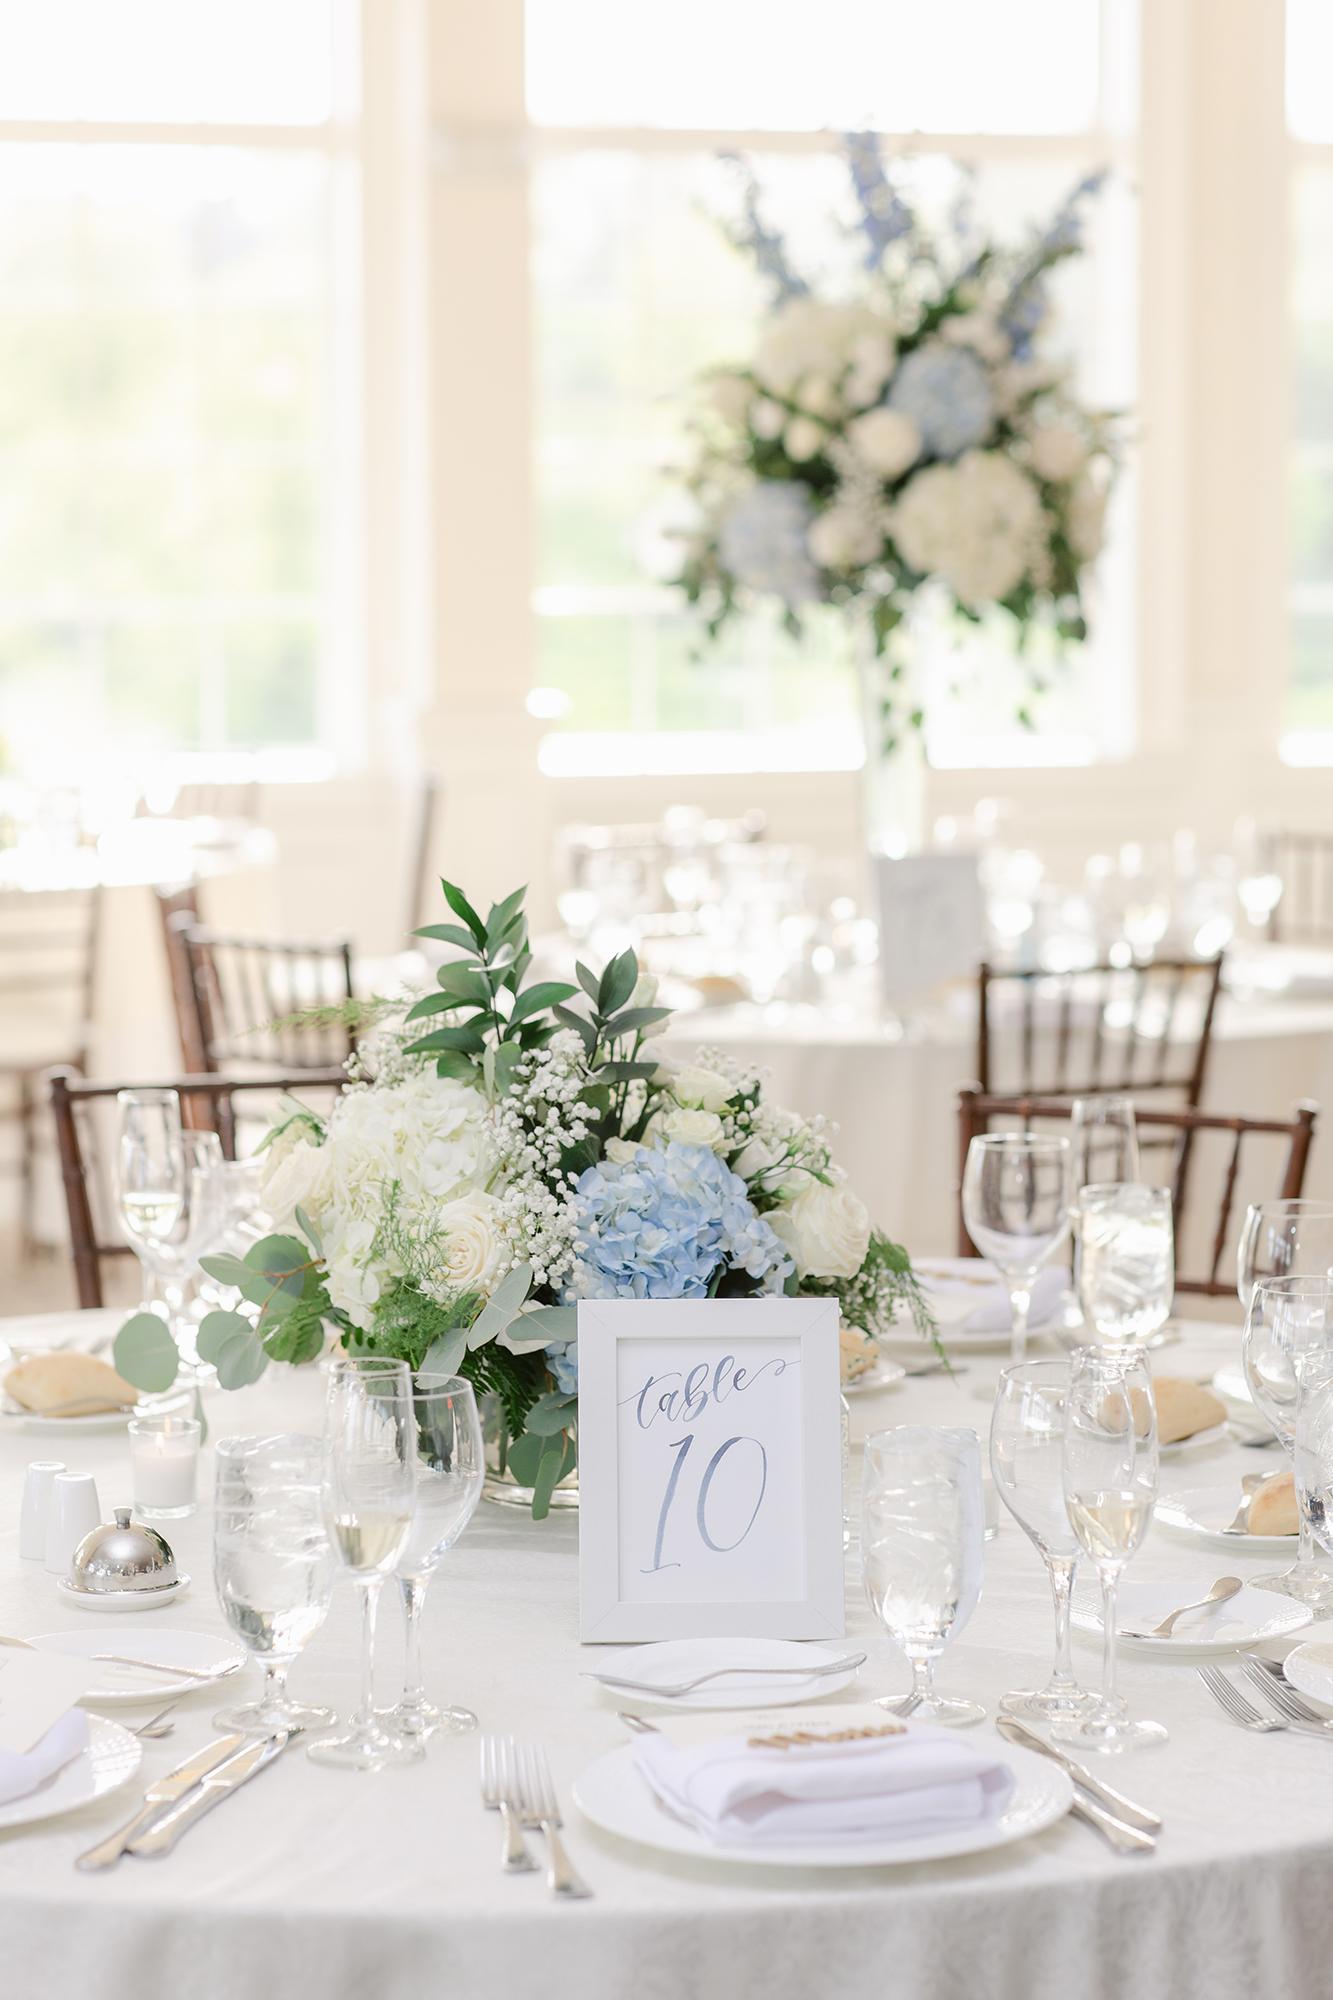 Sam Allen Creates Watercolor Table Number Sign for Wedding Reception Dinner Tablescape Katie+Mark-Wedding-780 Lauren Kearns Photography